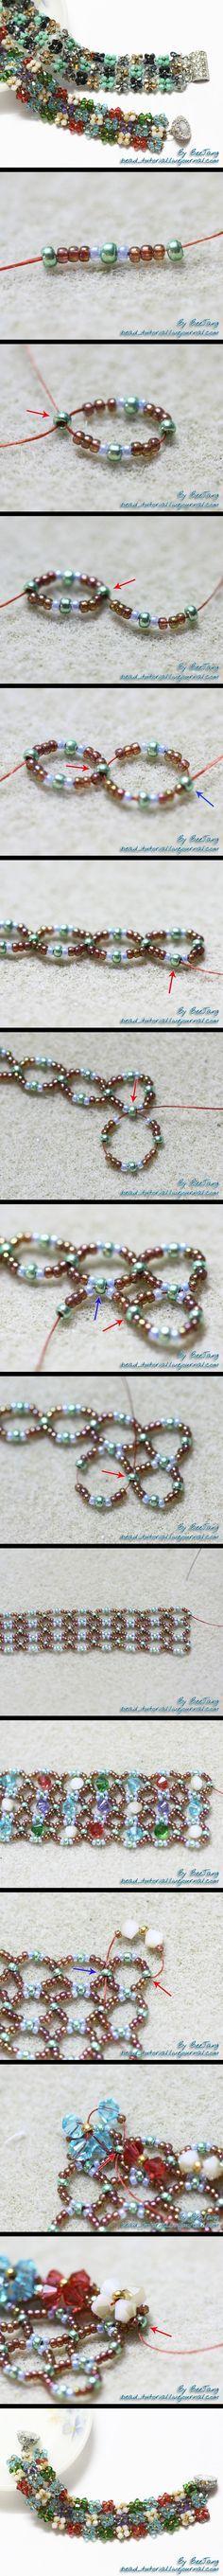 PAP bracelete